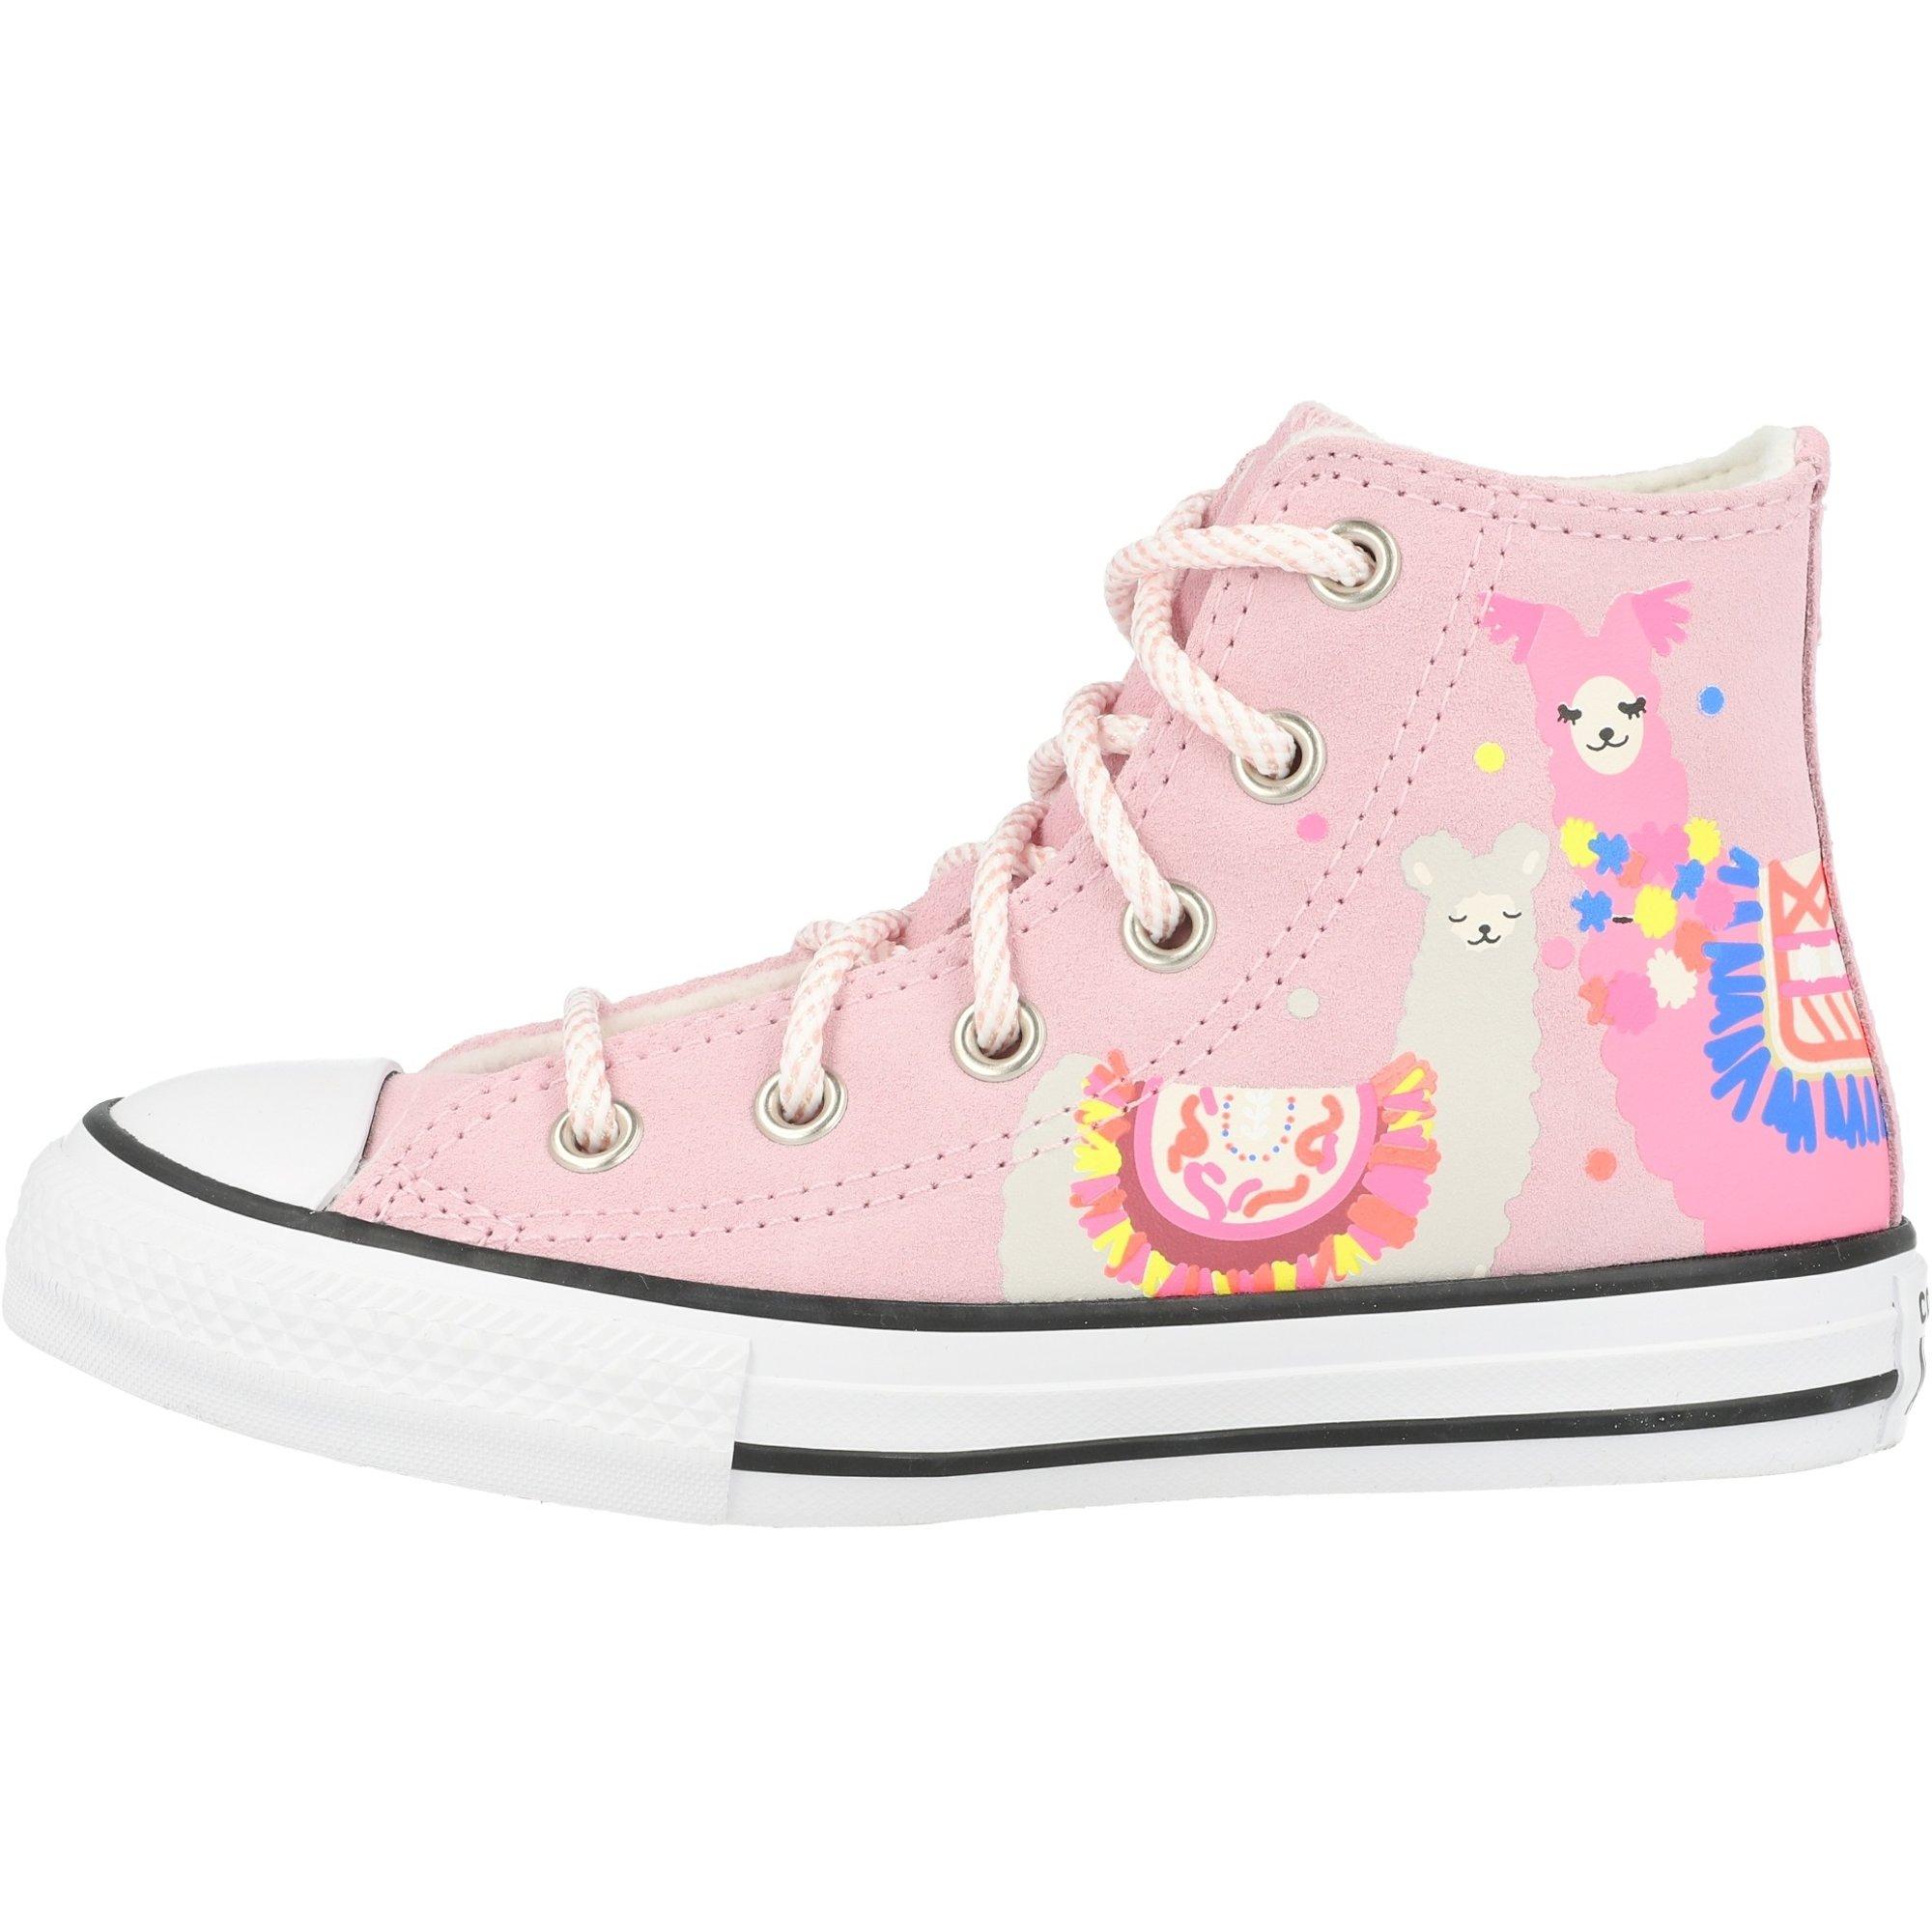 Converse Chuck Taylor All Star Hi Lama Cherry Blossom/Black Suede